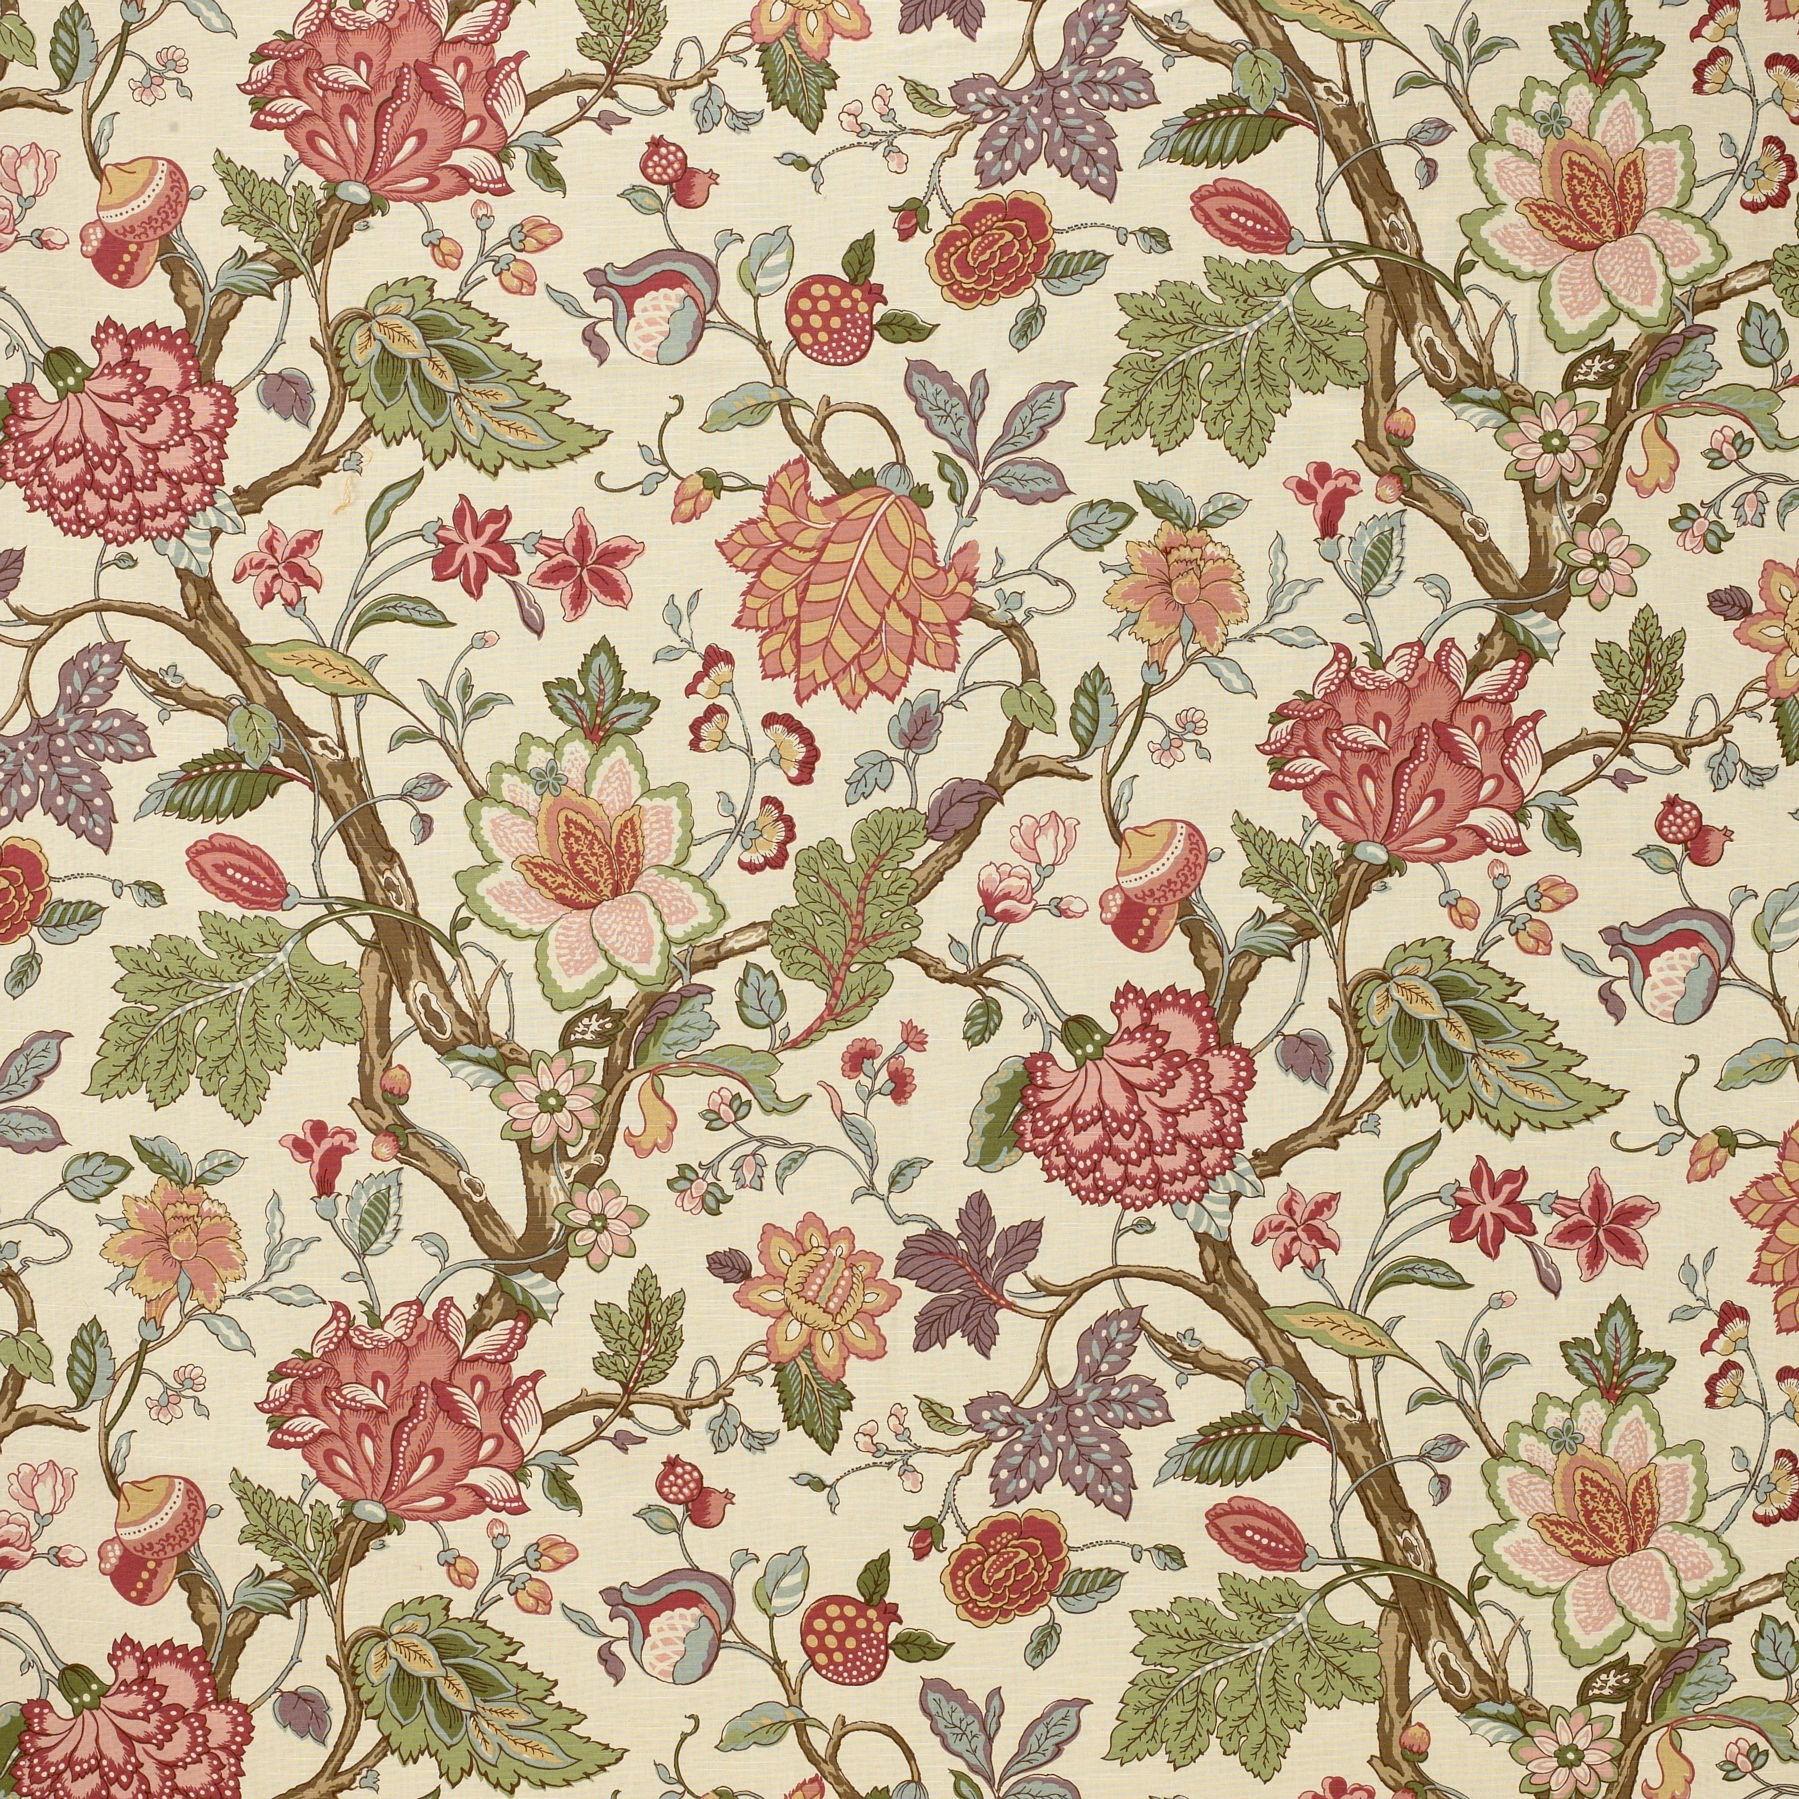 Laura Ashley Fabrics SOMERFIELD LA1324 303 BAYBERRY